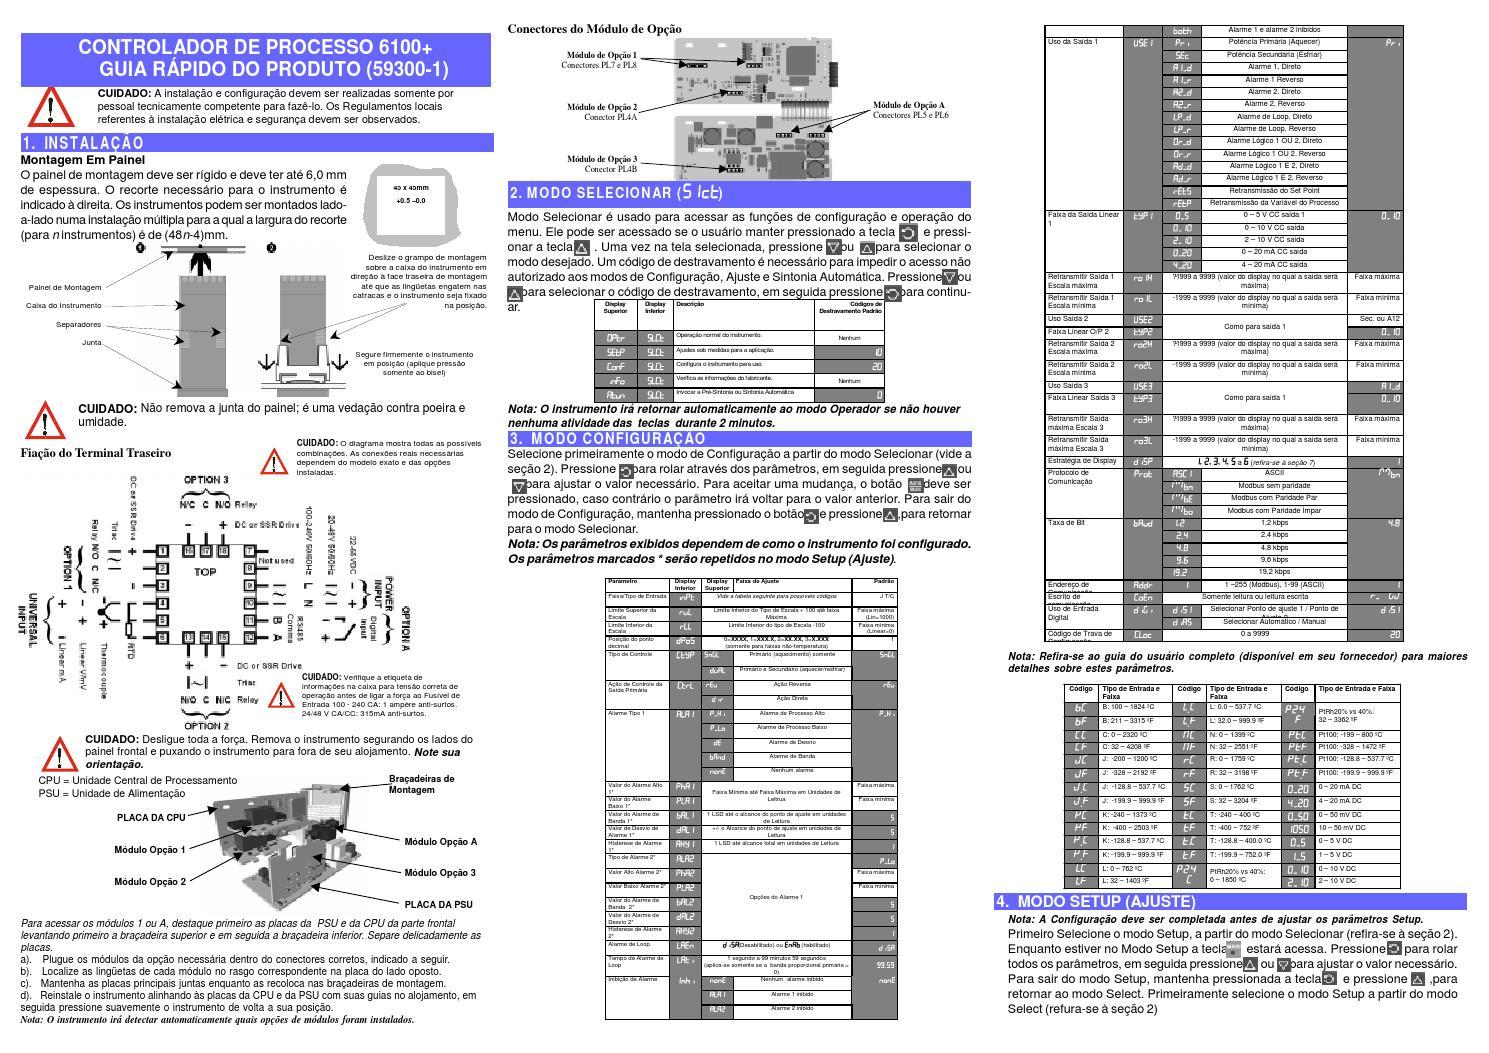 Controlador west p6100 manual portugues resumido by Veeder Root Manual em  Portugues - issuu